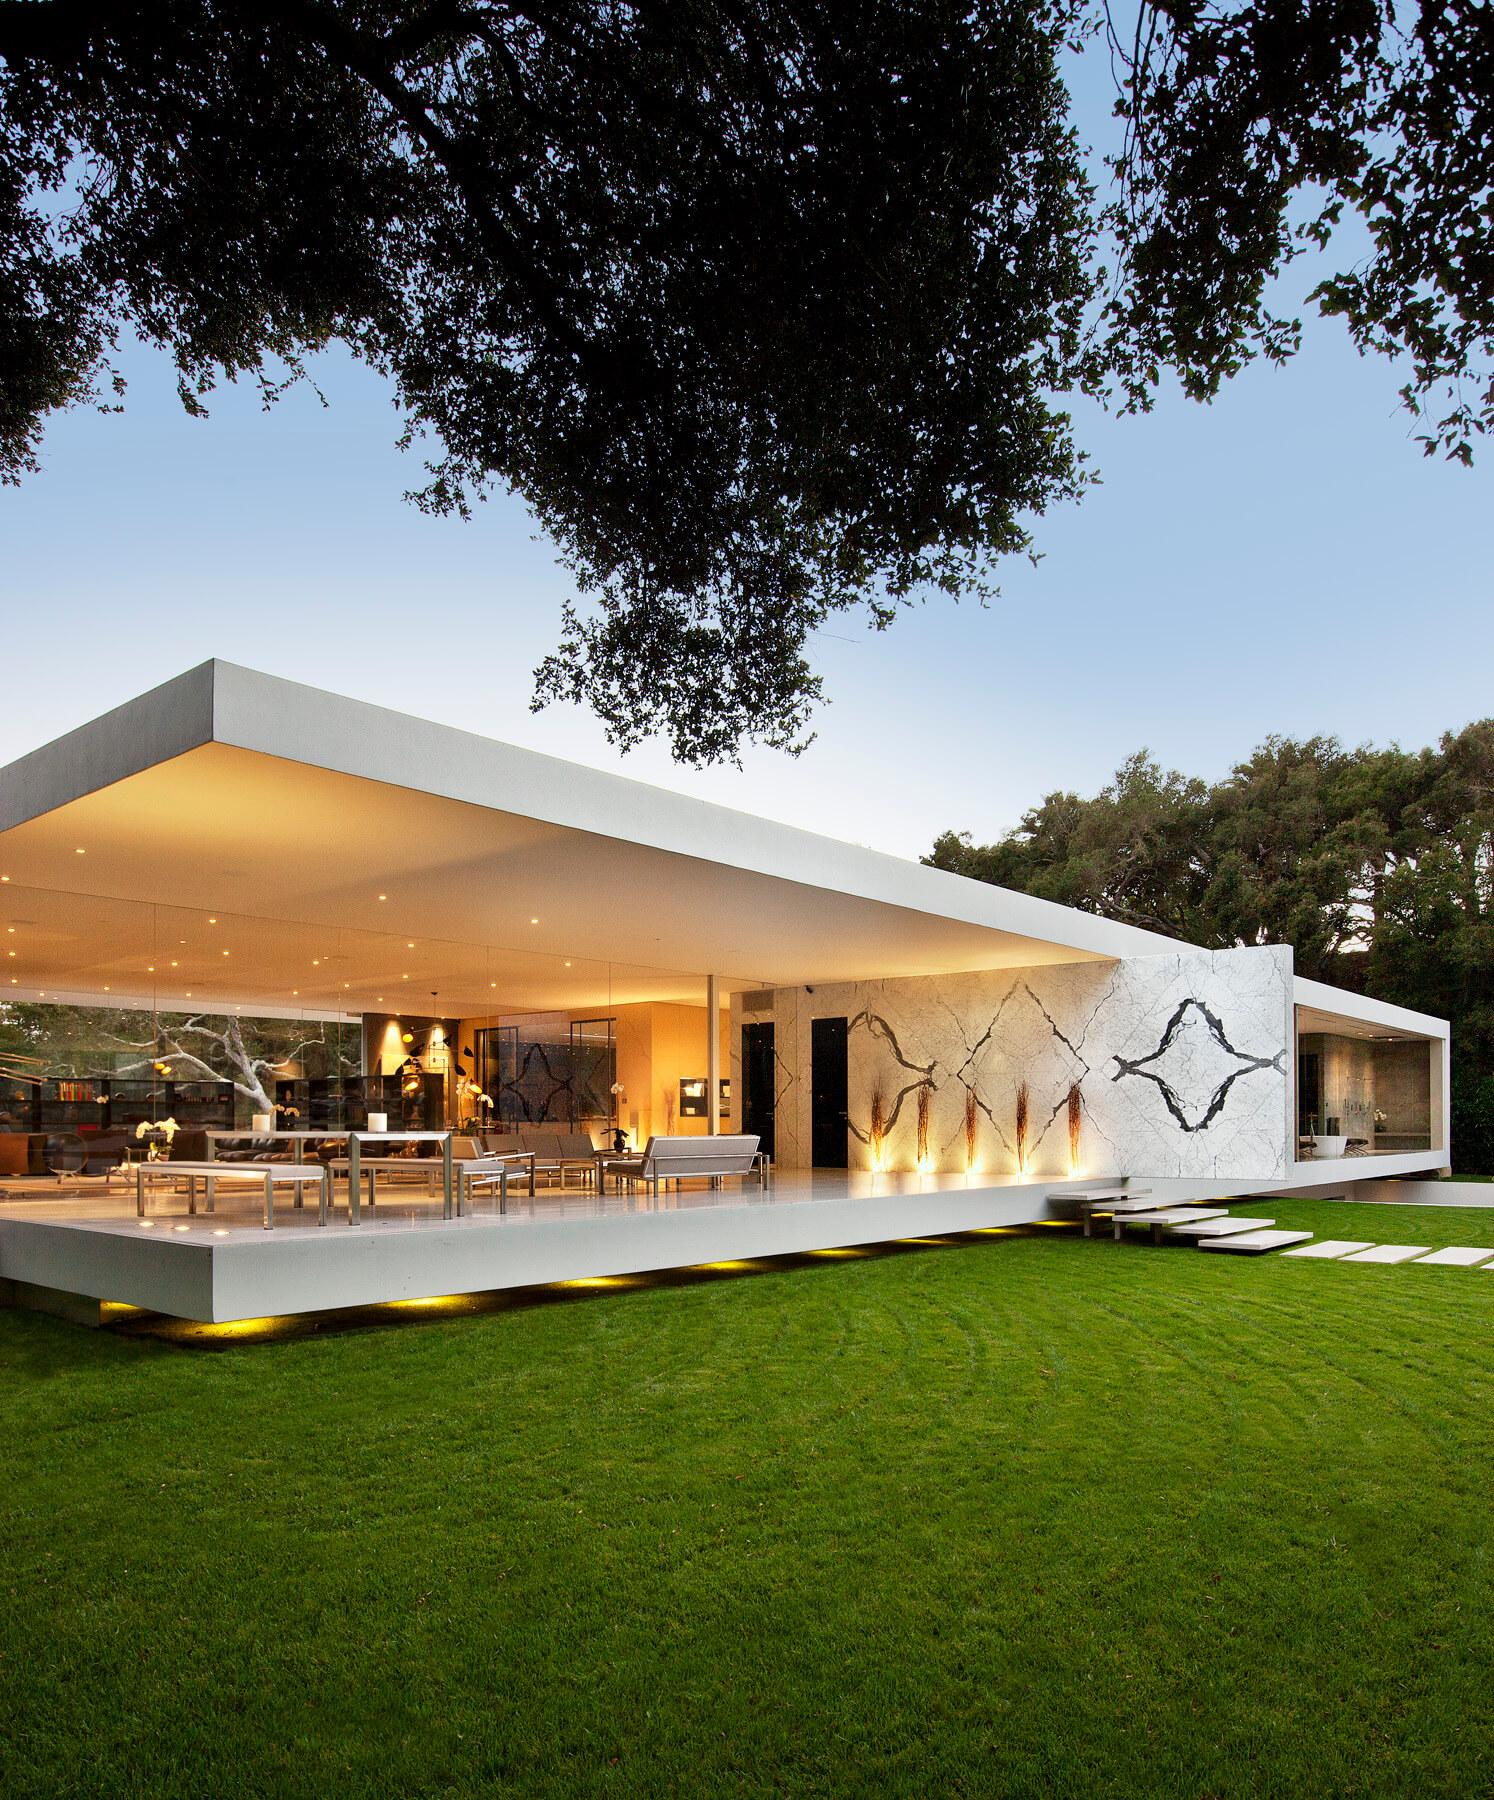 The Glass Pavilion by Steve Hermann